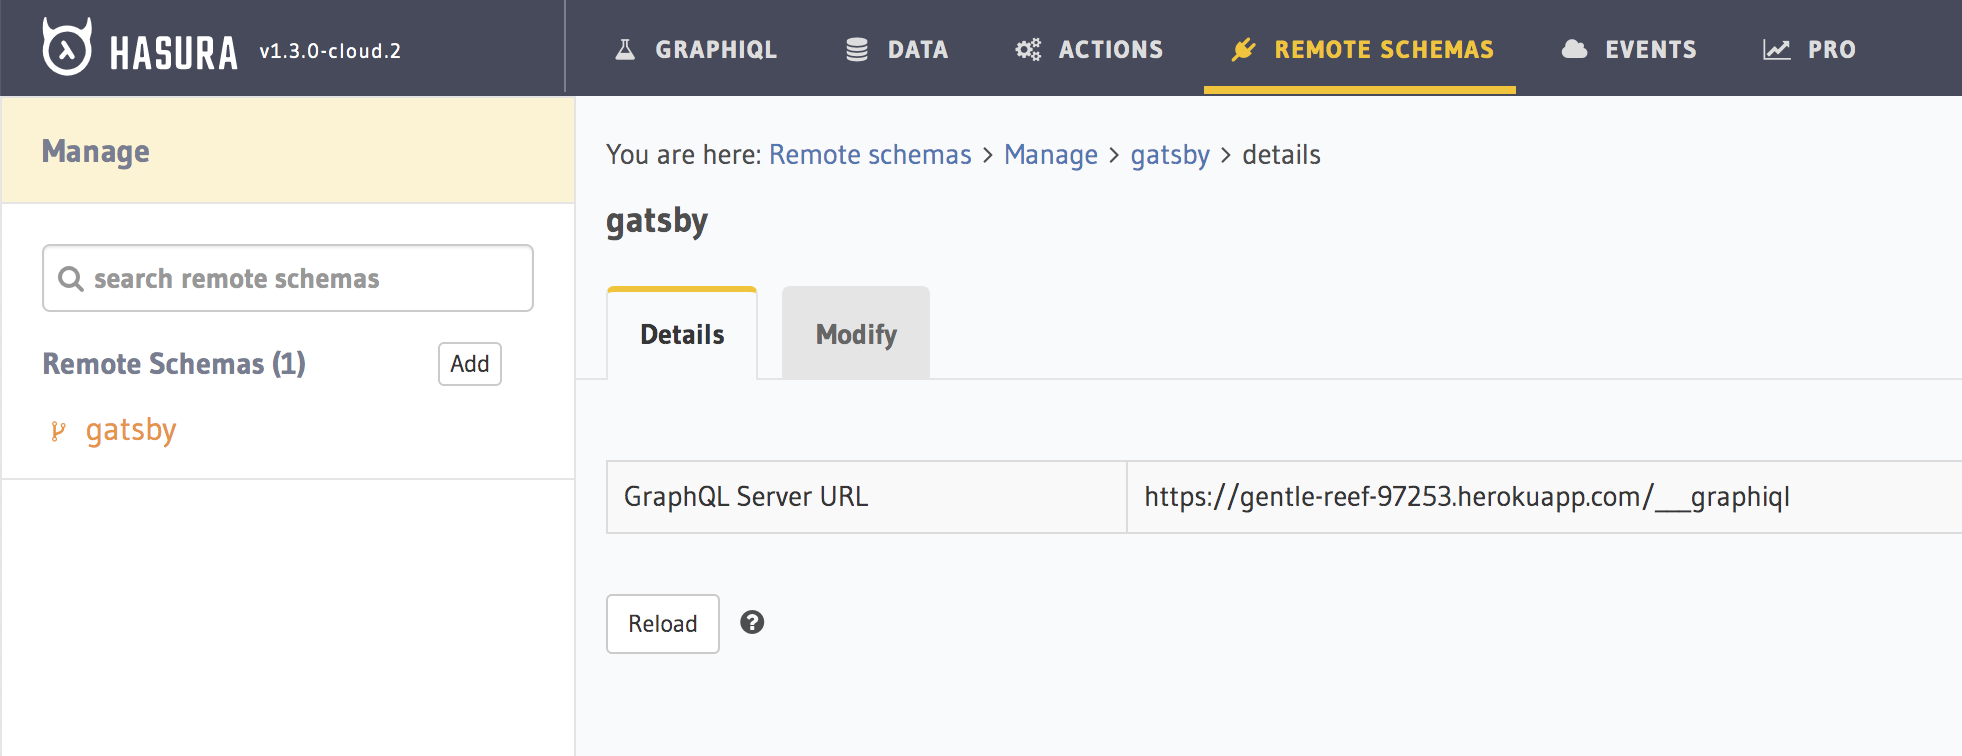 Gatsby Remote Schema added to Hasura